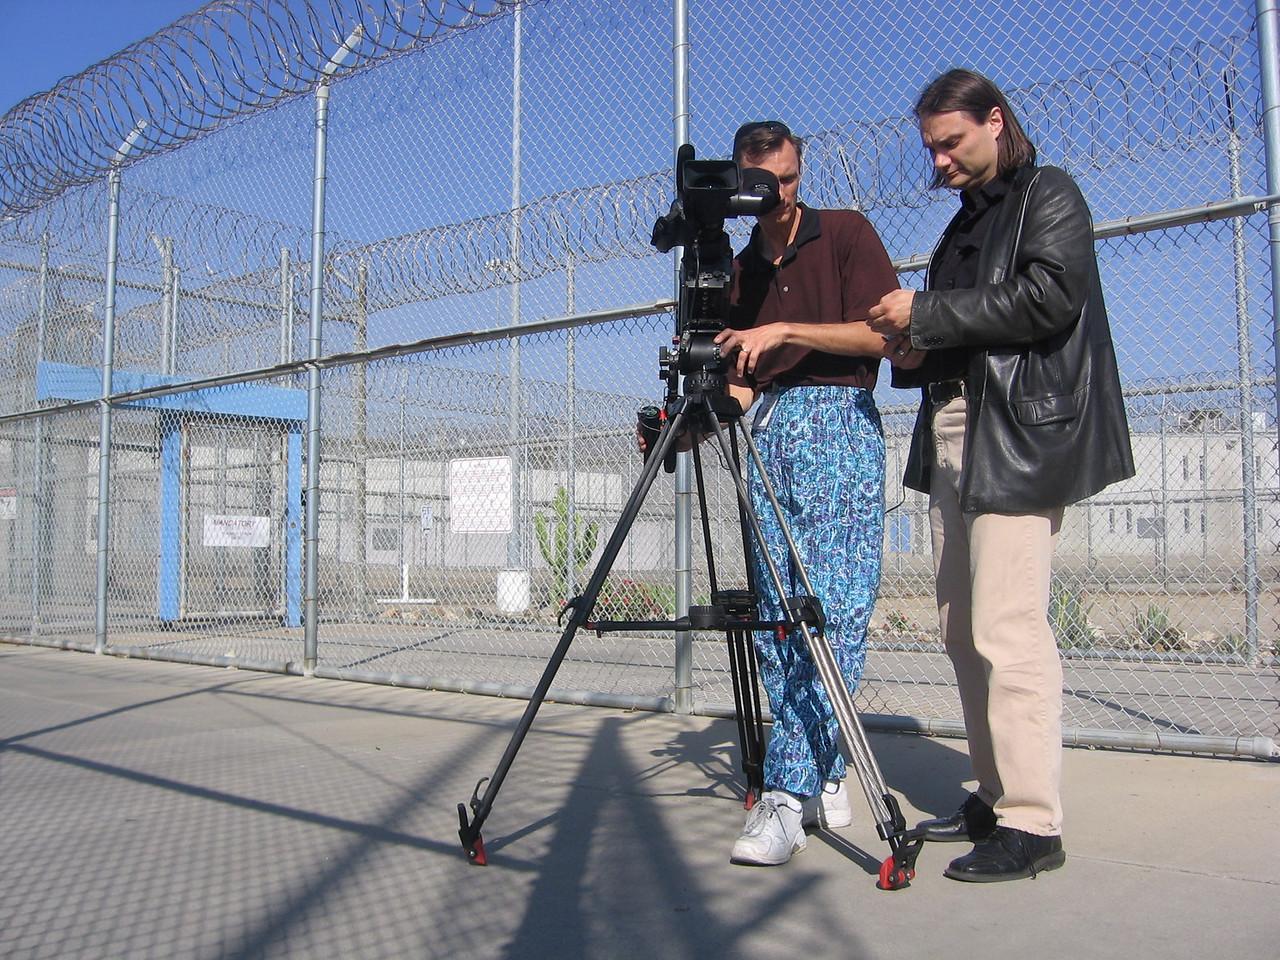 Shooting at a California prison...see previous shot for explanation regarding the pants.